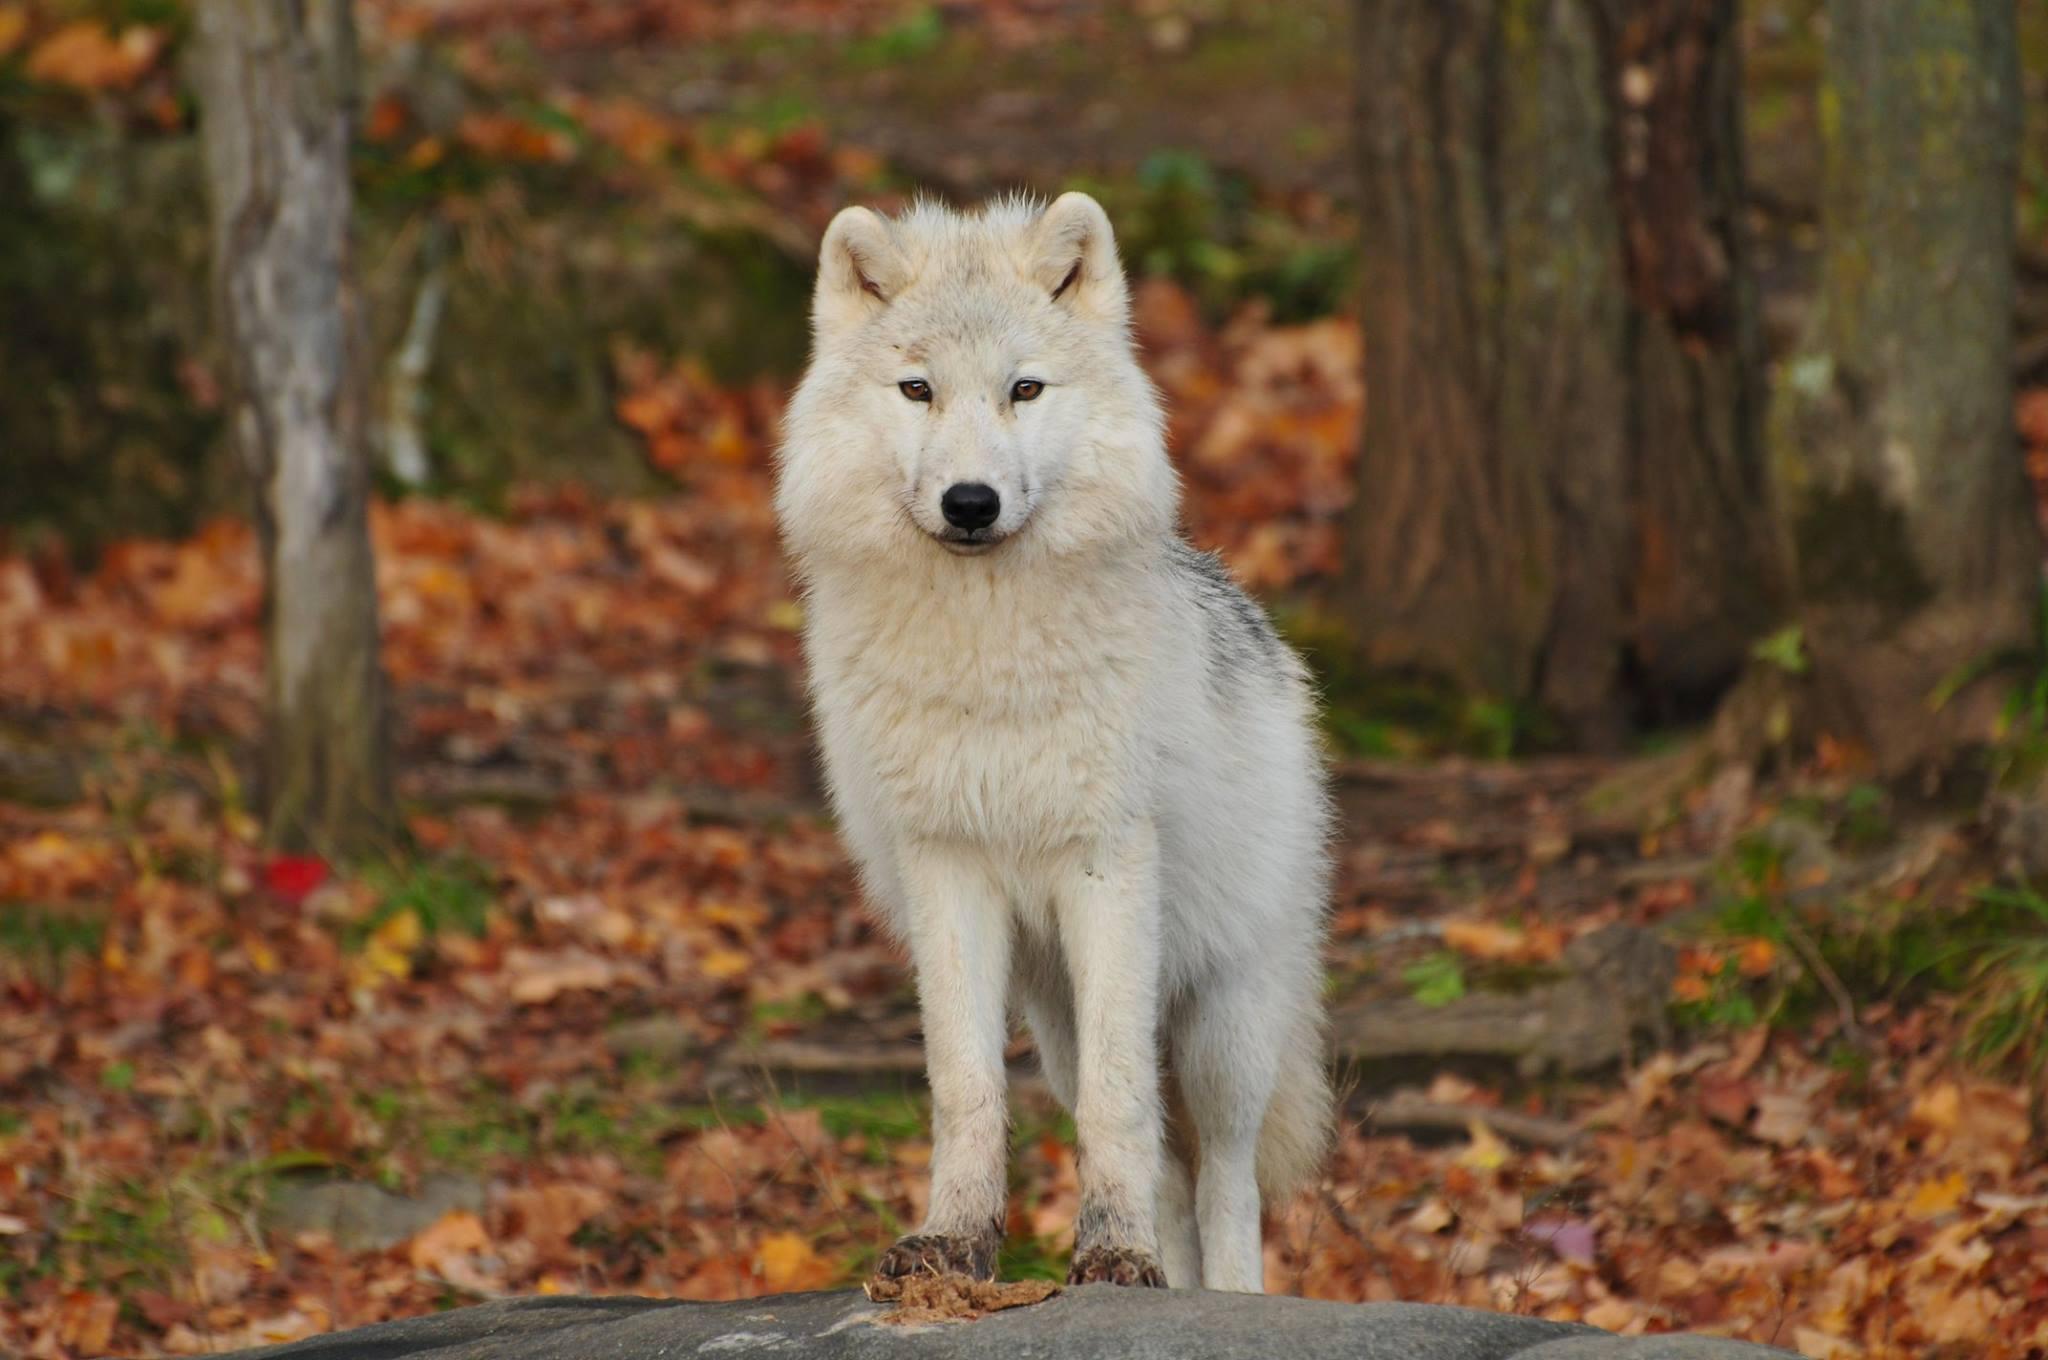 102749 descarga Blanco fondos de pantalla para tu teléfono gratis, Animales, Lobo, Depredador Blanco imágenes y protectores de pantalla para tu teléfono